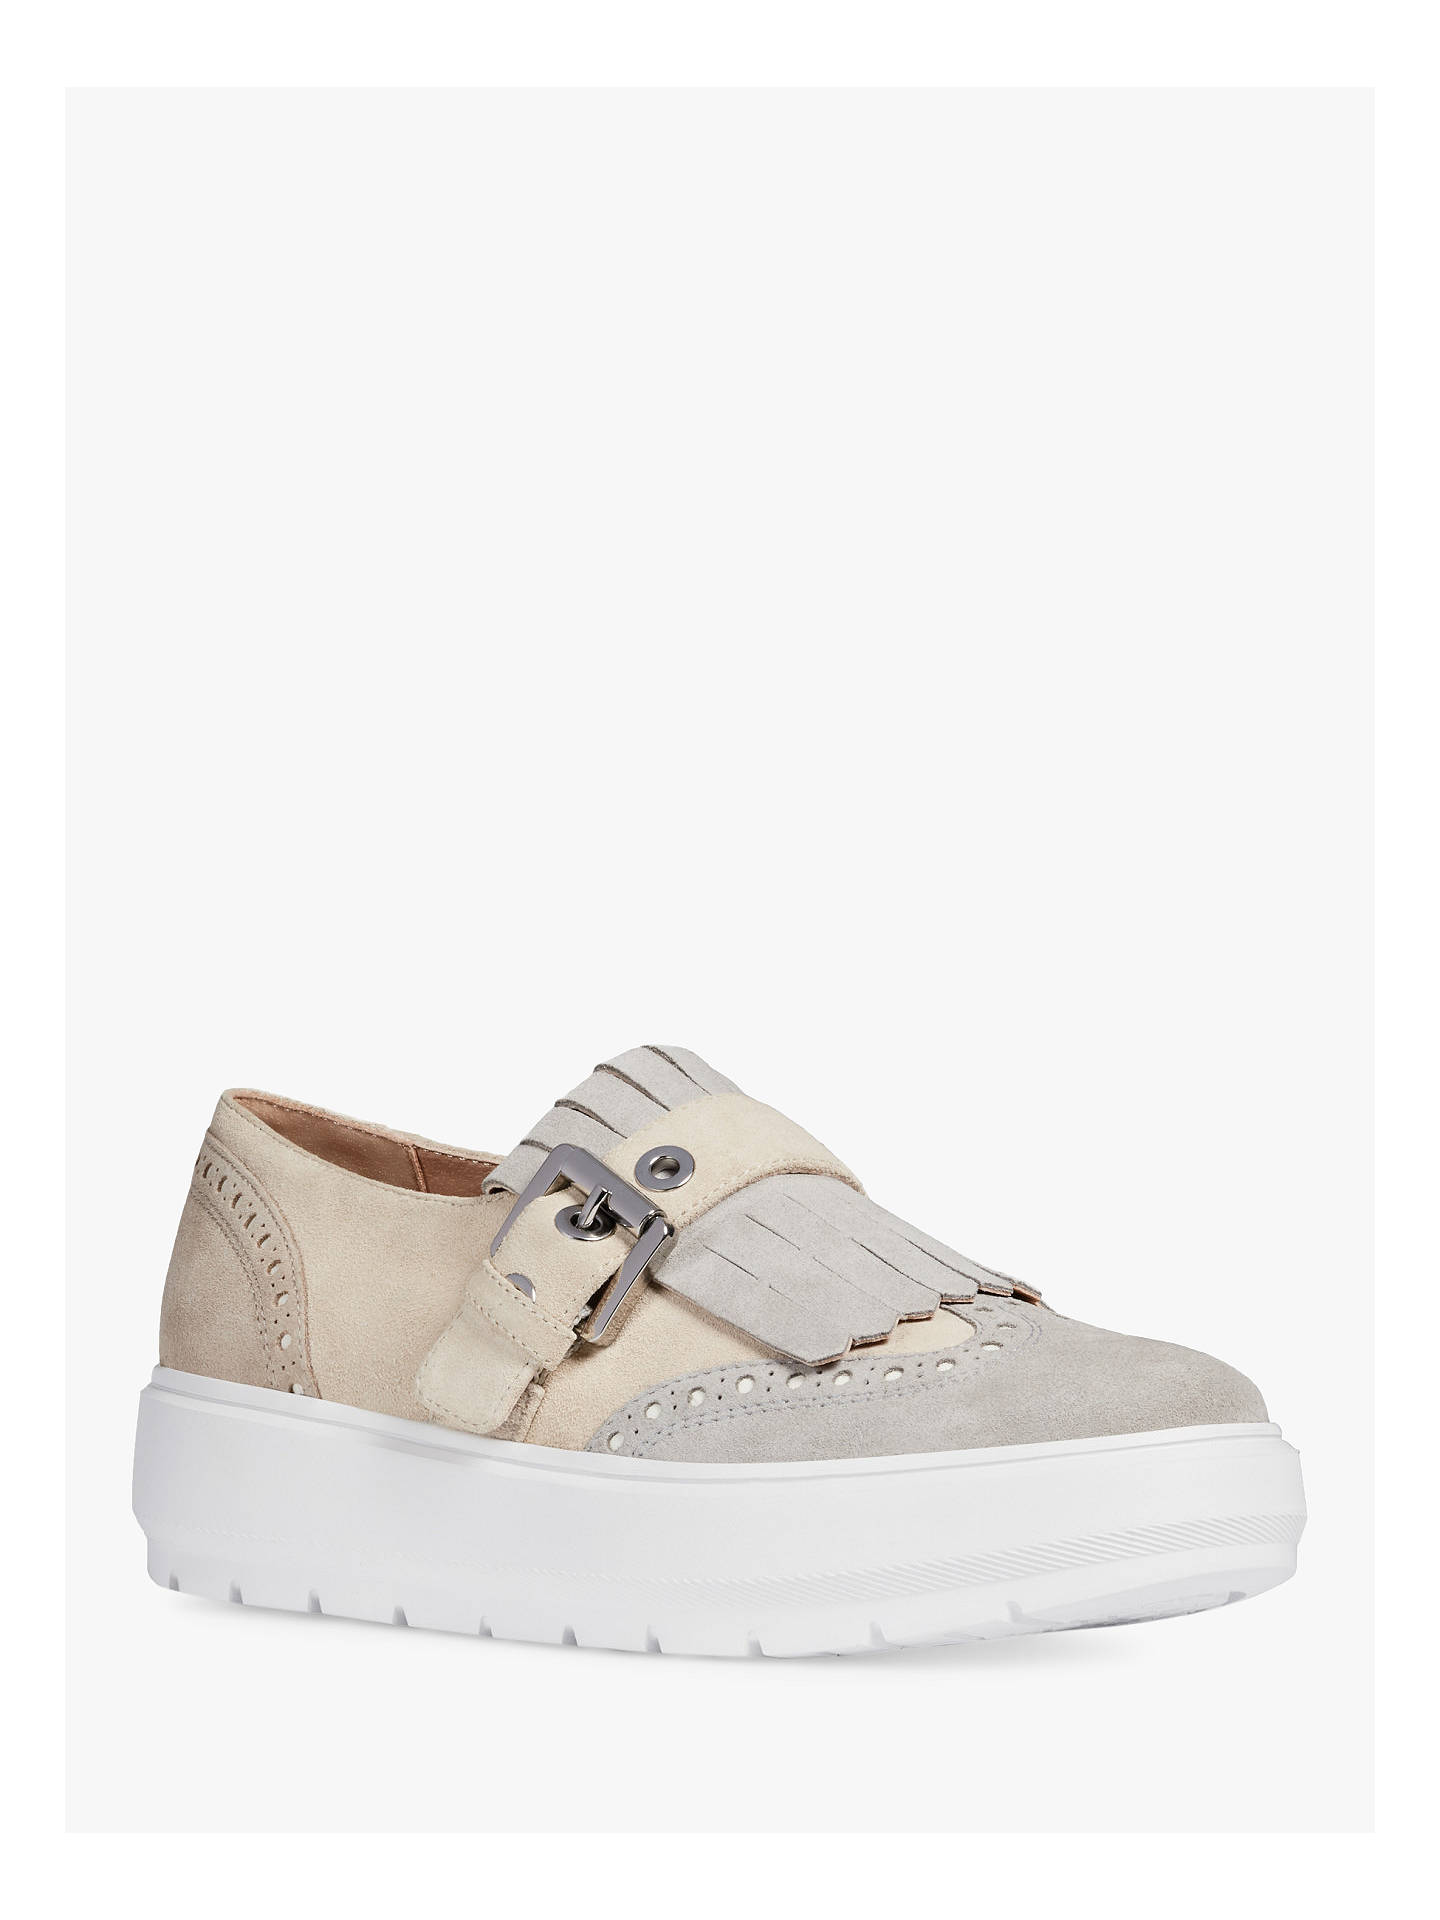 tarjeta Comorama Egipto  Geox Kaula Slip On Flatform Loafers, Cream/Light Grey Leather at John Lewis  & Partners